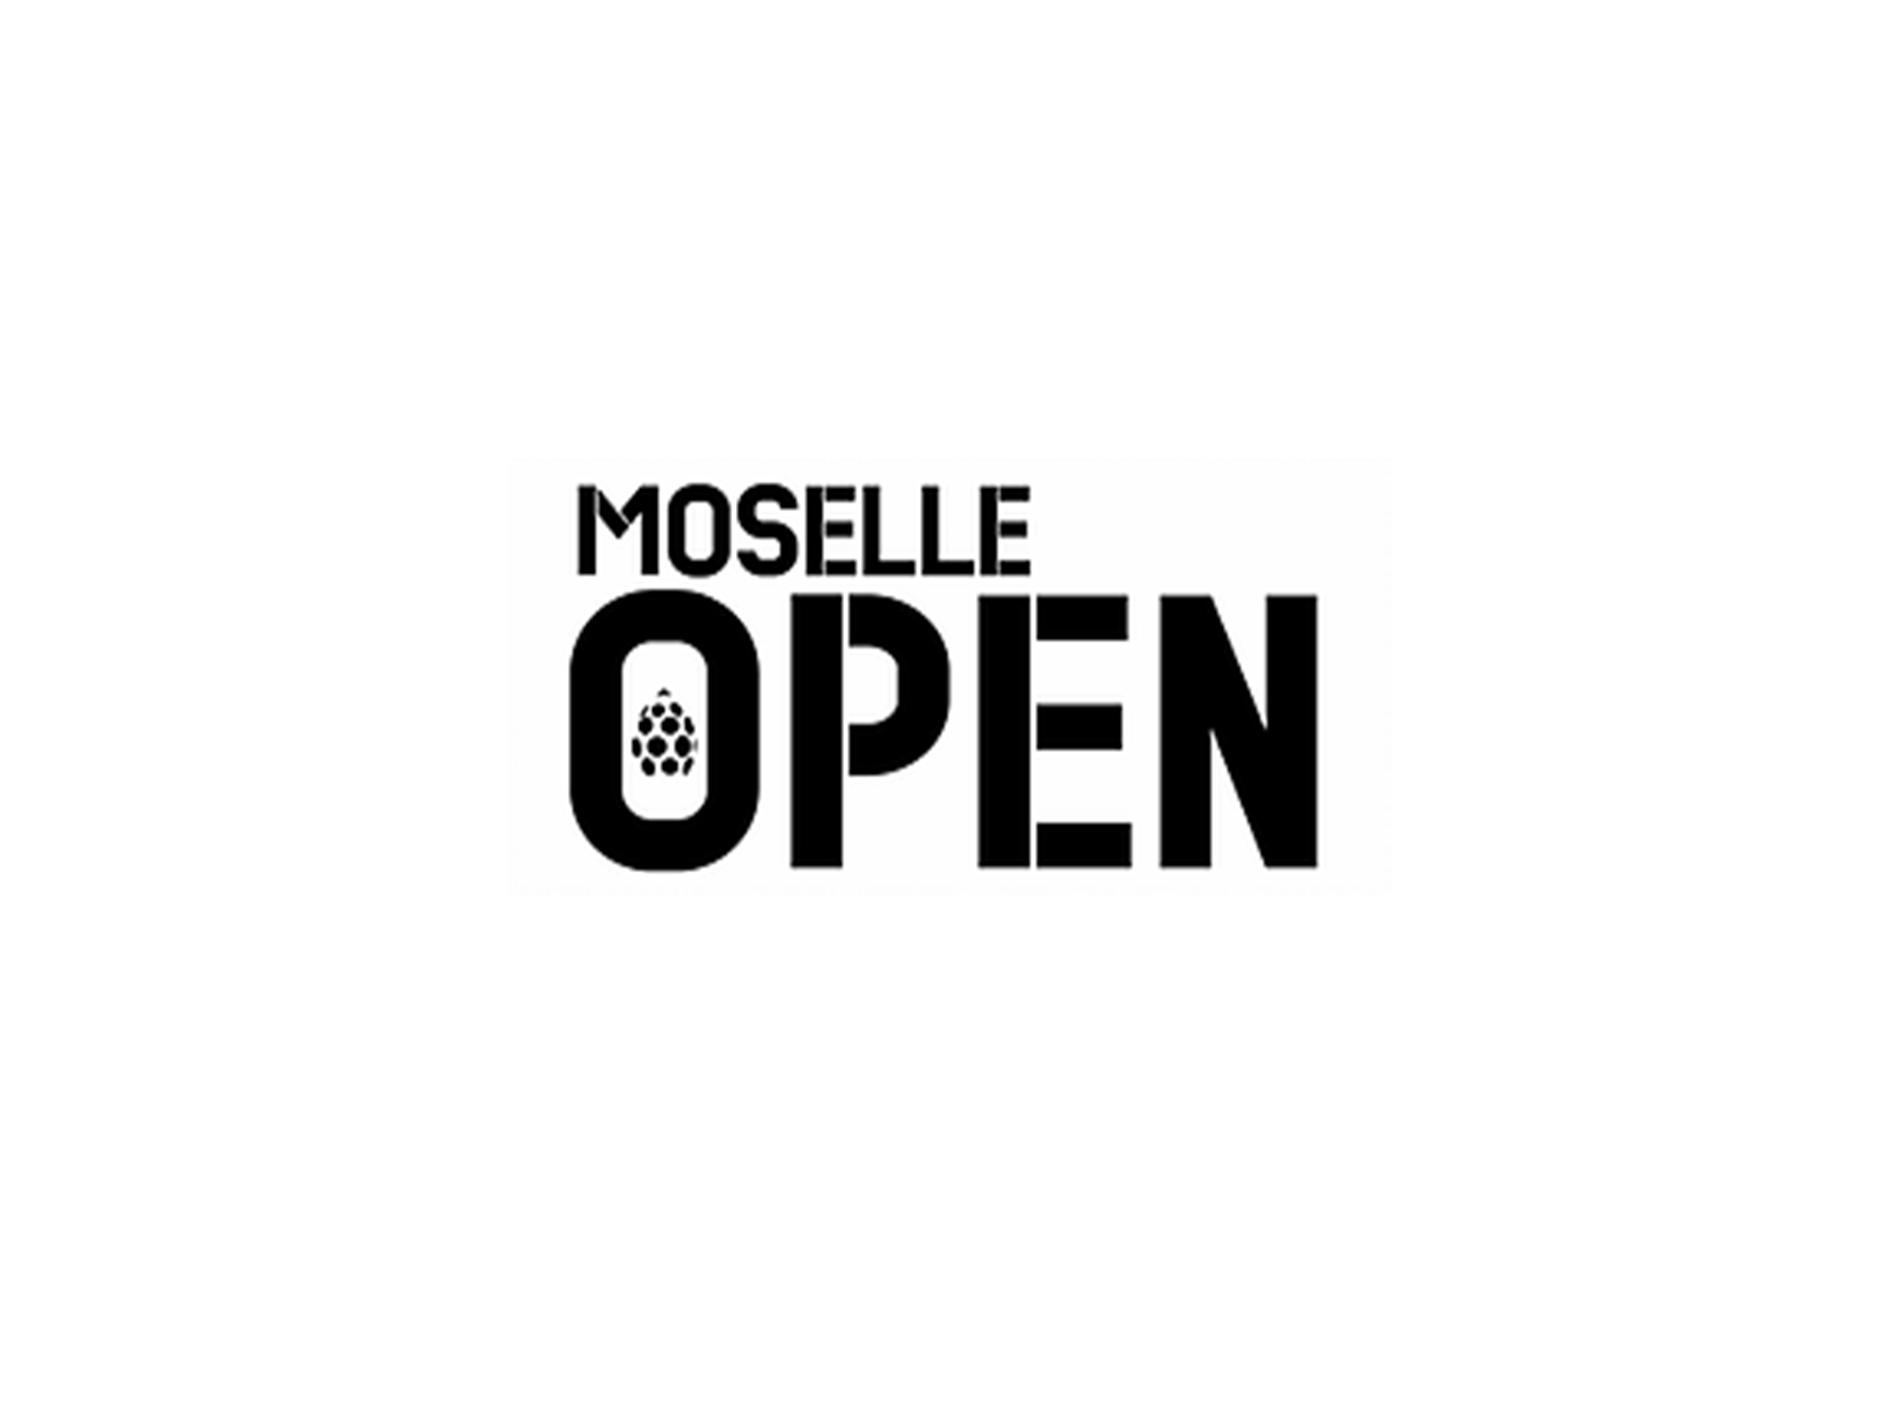 MOSELLE OPEN